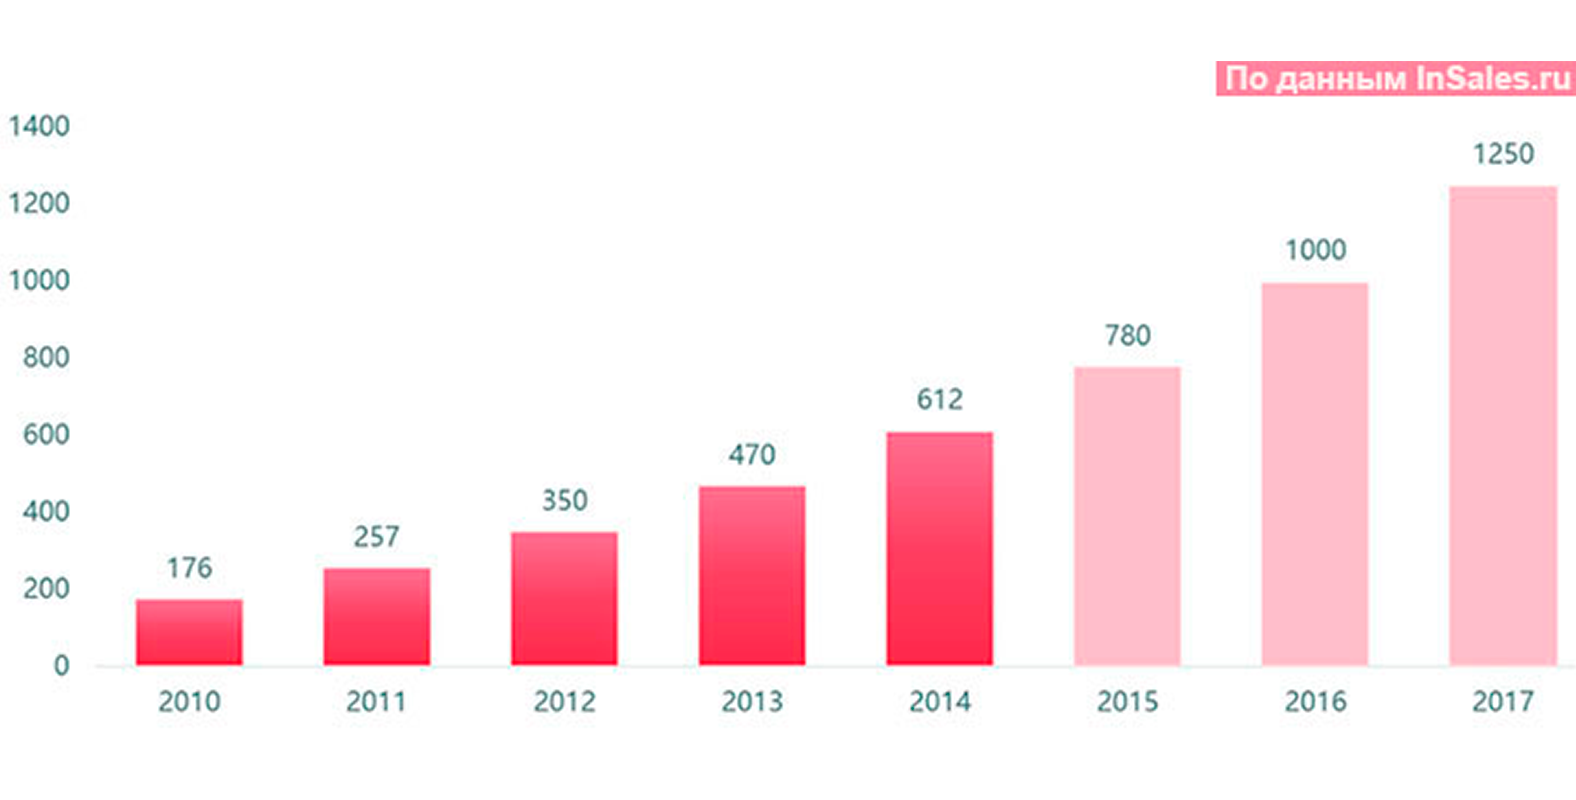 статистика онлайн торговли Insales